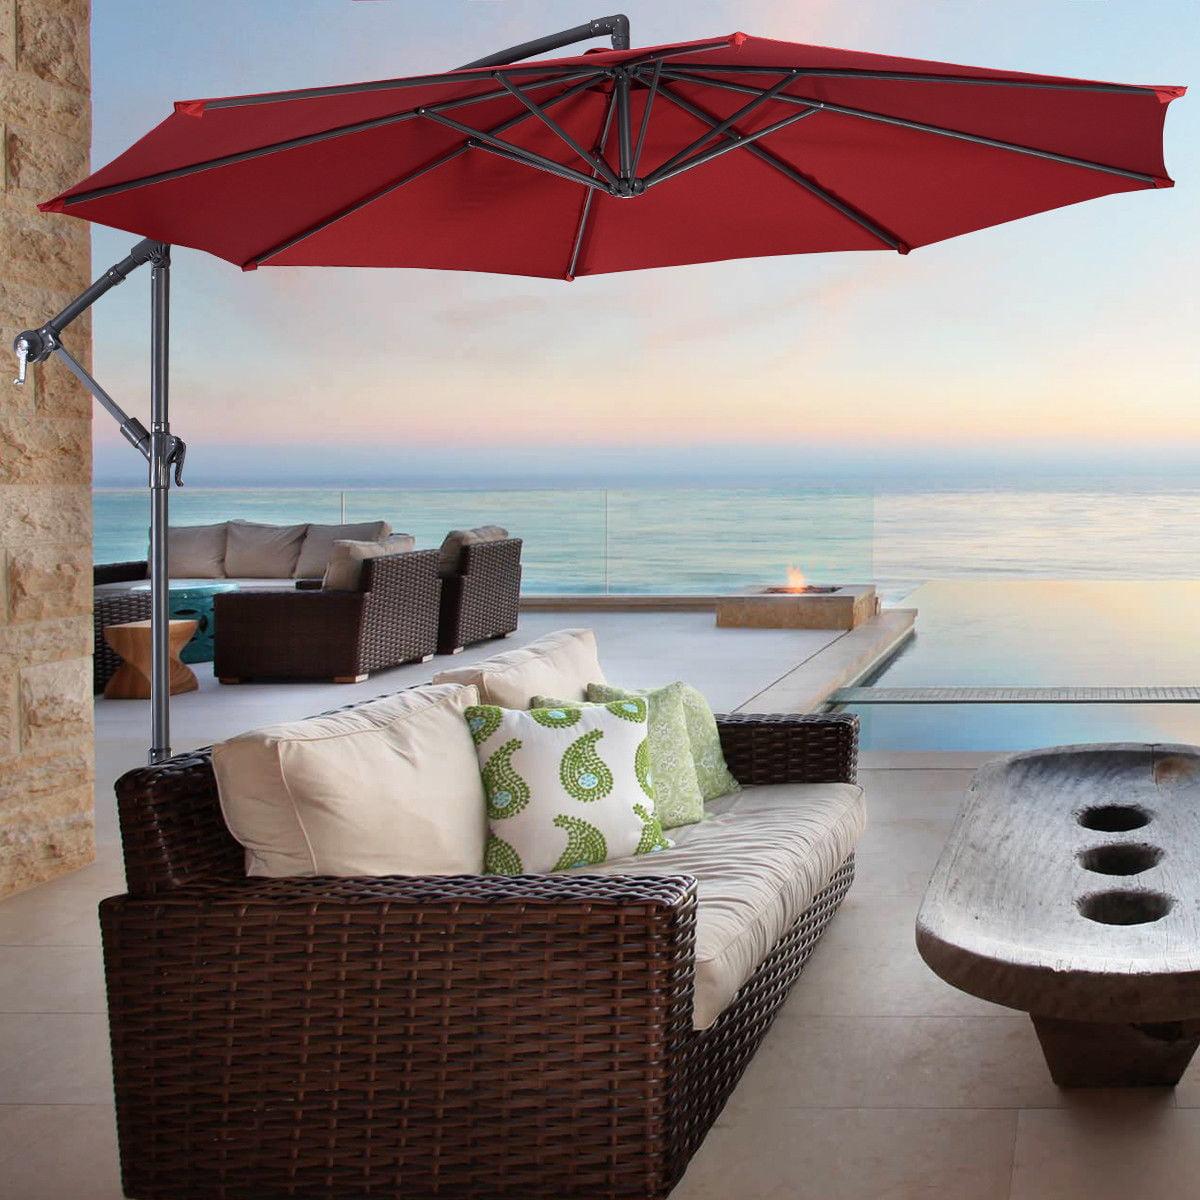 Costway 10' Hanging Umbrella Patio Sun Shade Offset Outdoor Market W/t Cross Base (Burgundy)